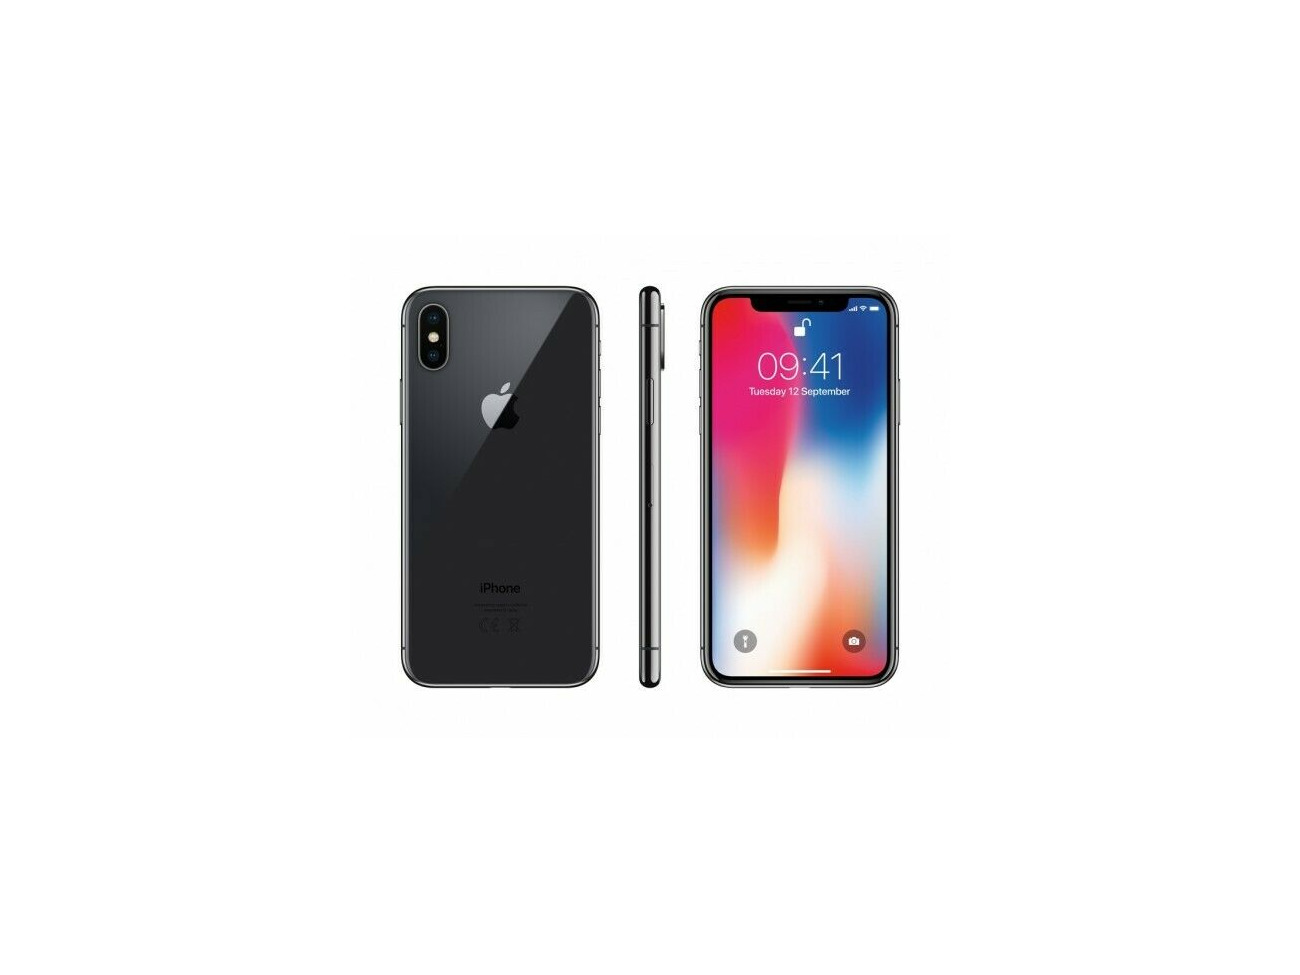 b6f24f2523a Rent Apple iPhone X (iPhone 10) 64GB & 256GB Unlocked SIM Free  Smartphone 2 Colours in Wolverhampton | Fat Llama